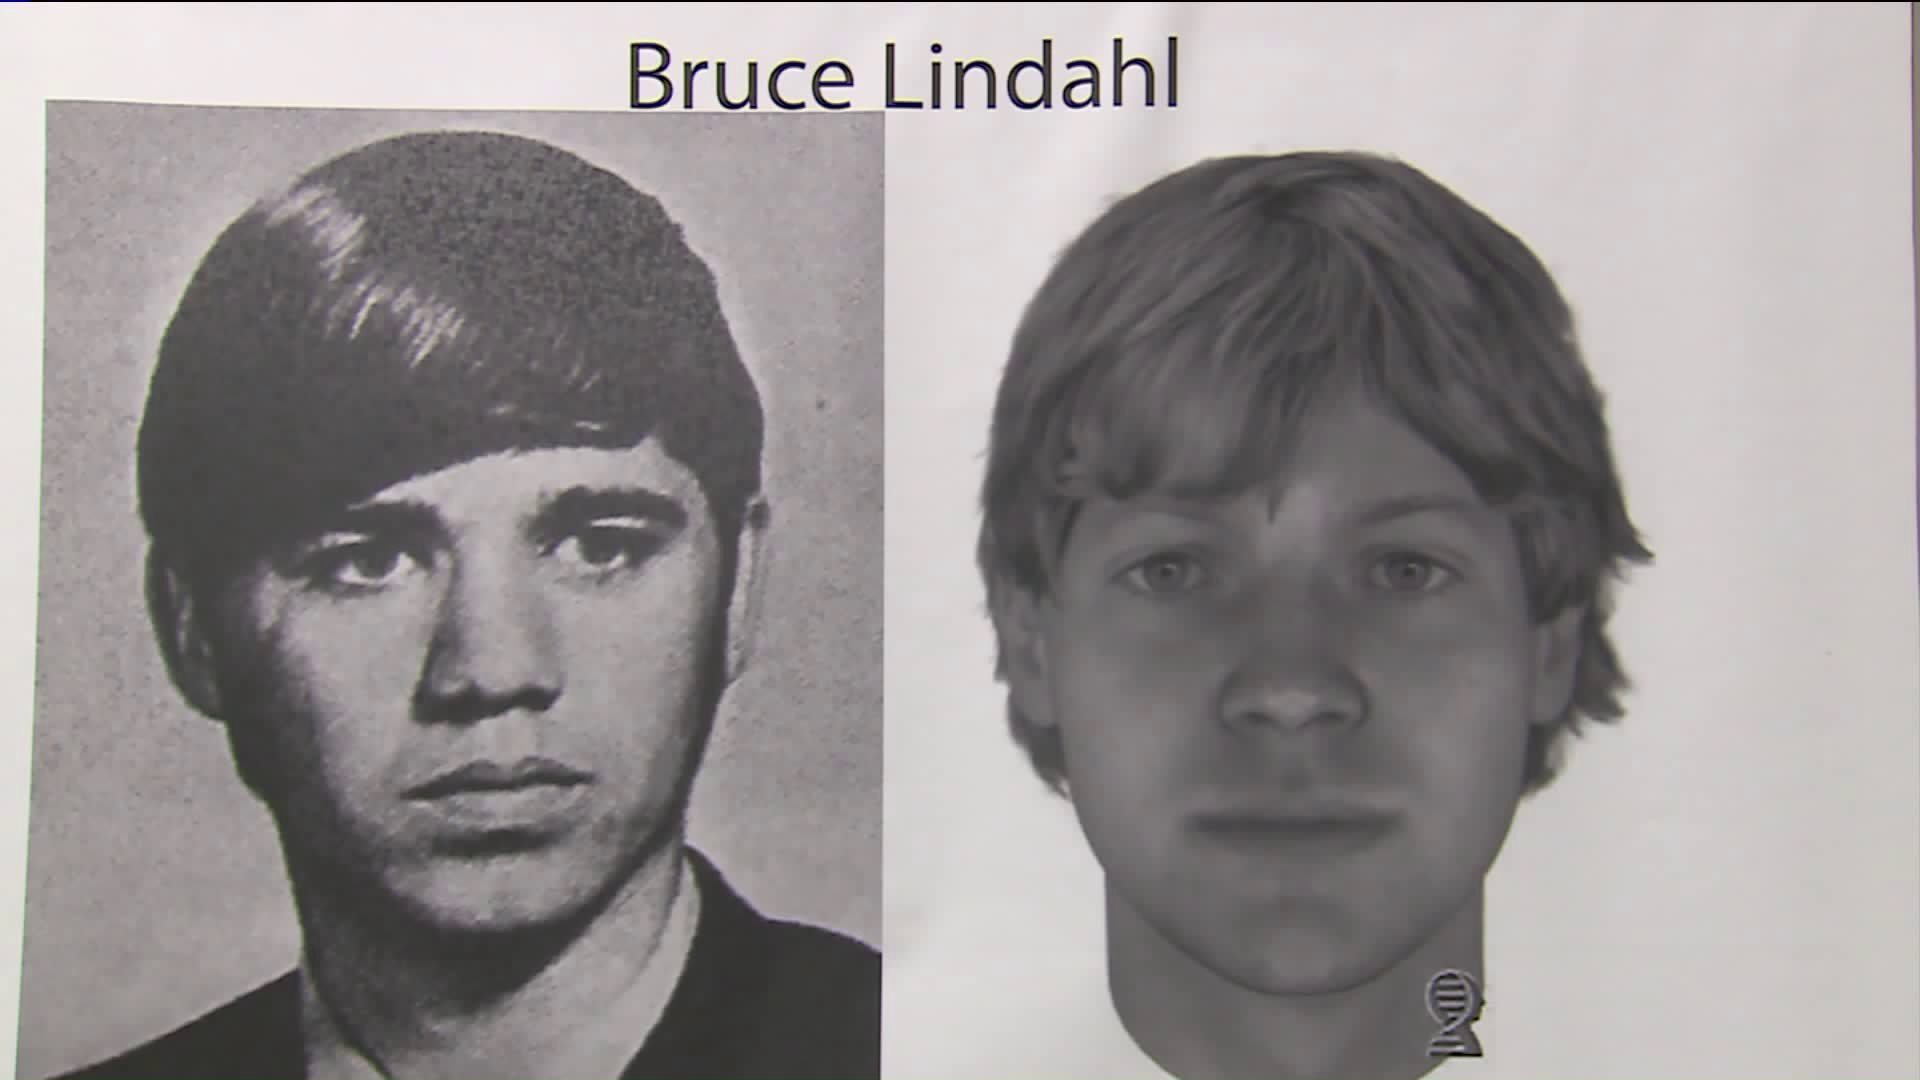 Bruce Lindahl